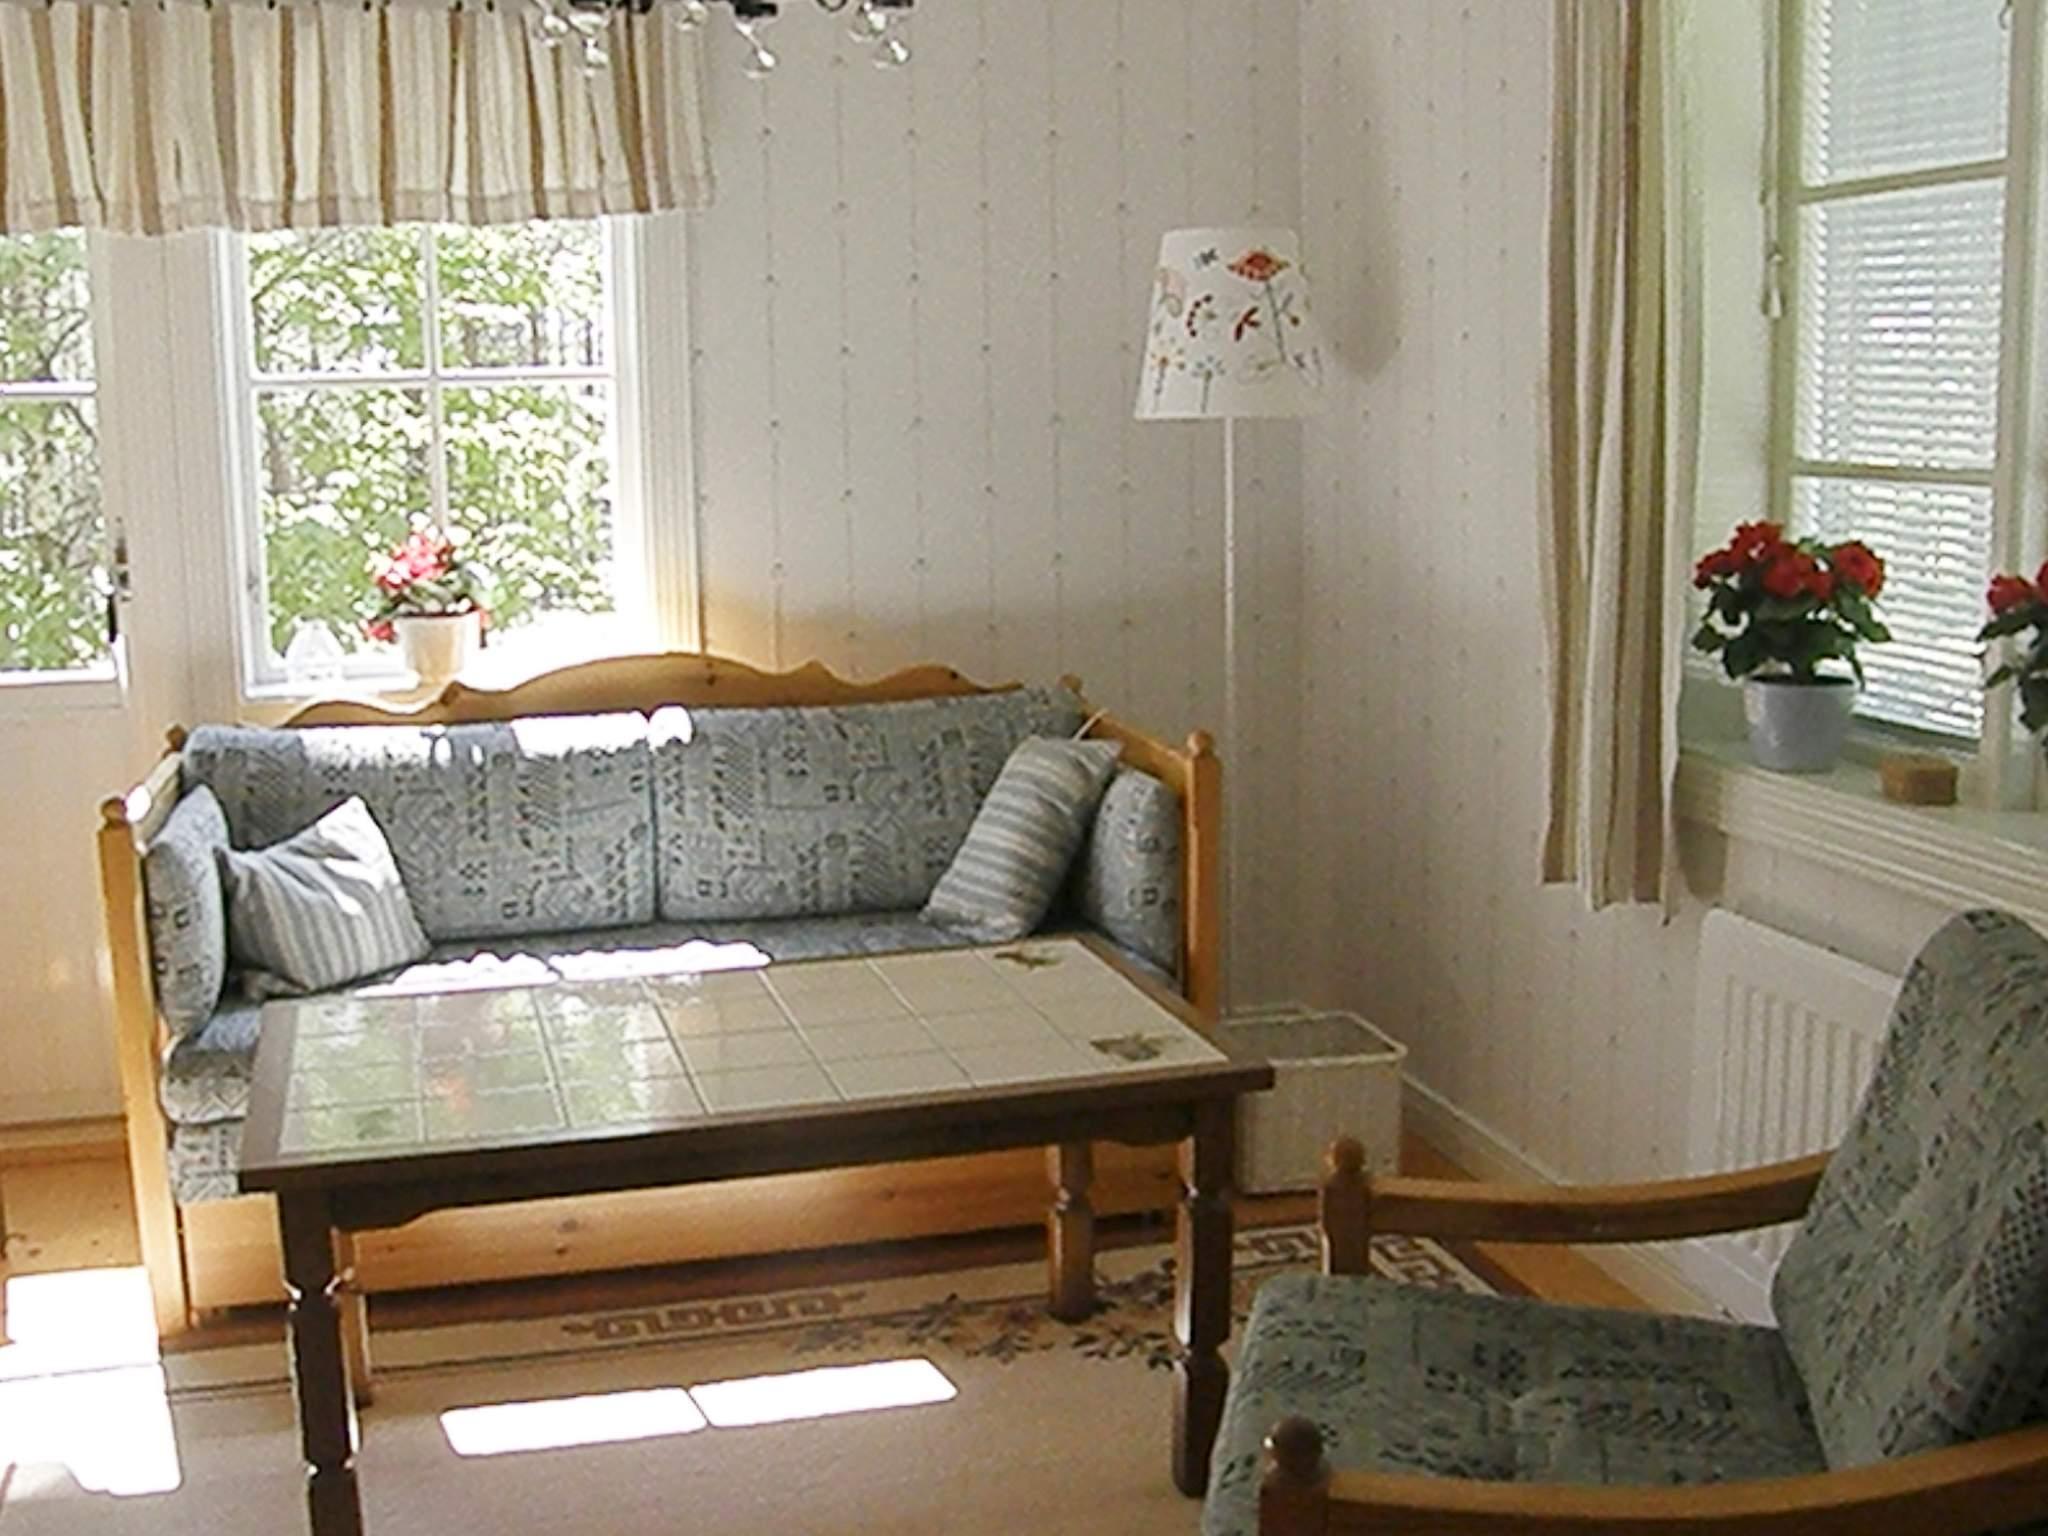 Ferienhaus Ivebo (87165), Östmark, Värmlands län, Mittelschweden, Schweden, Bild 6